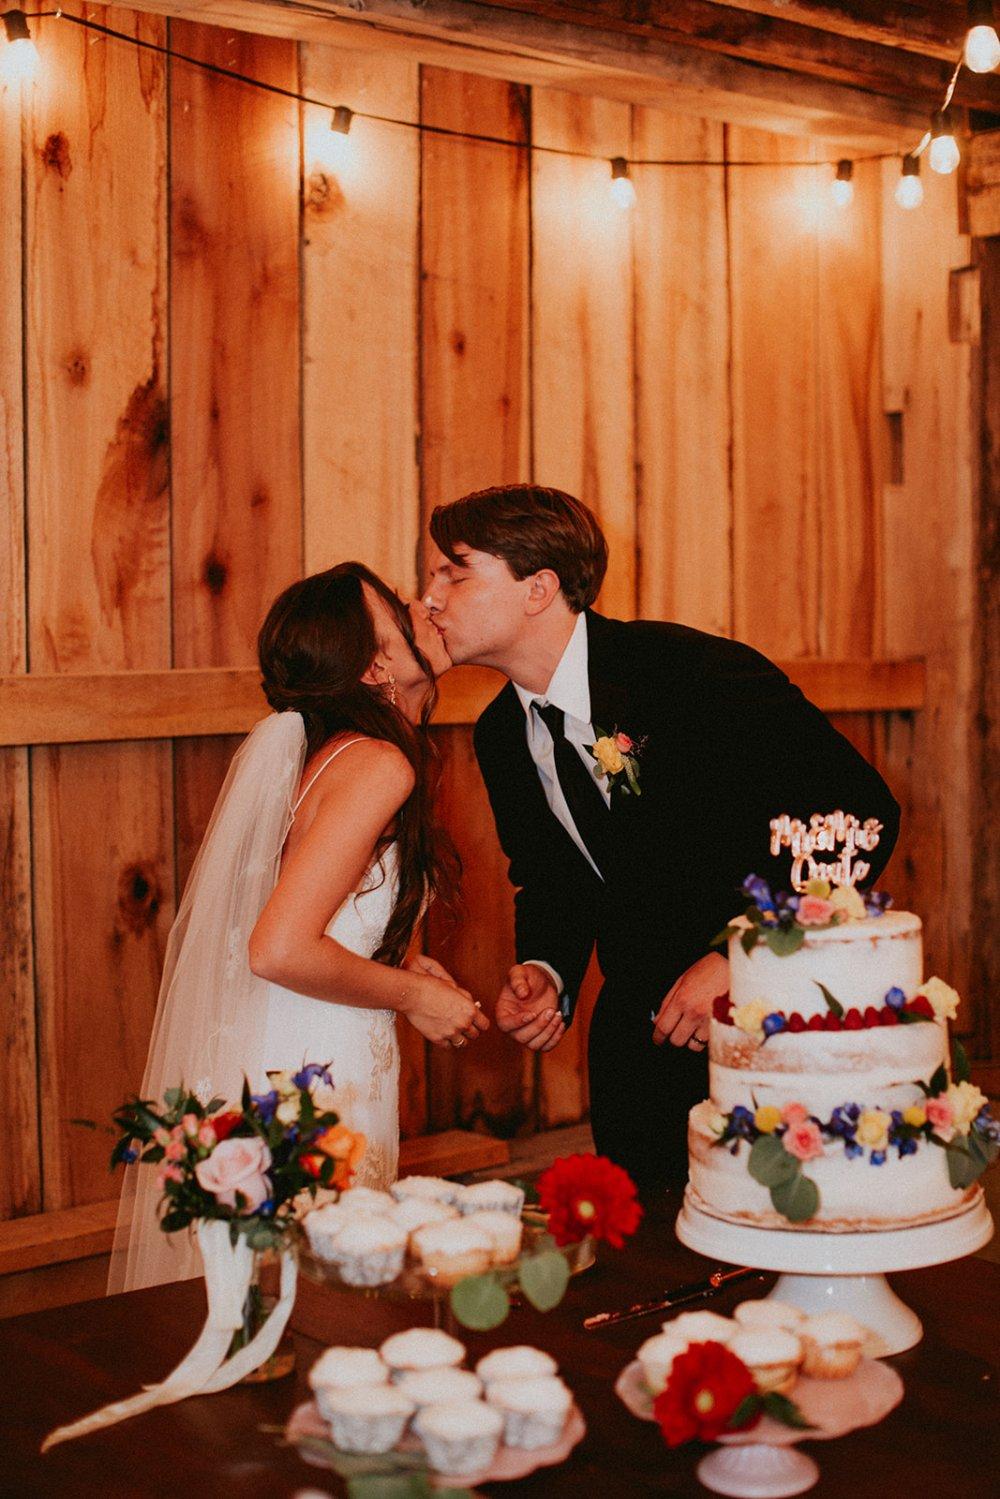 Calan-Adam-WEDDING-JUNE-2019-158 2.jpg